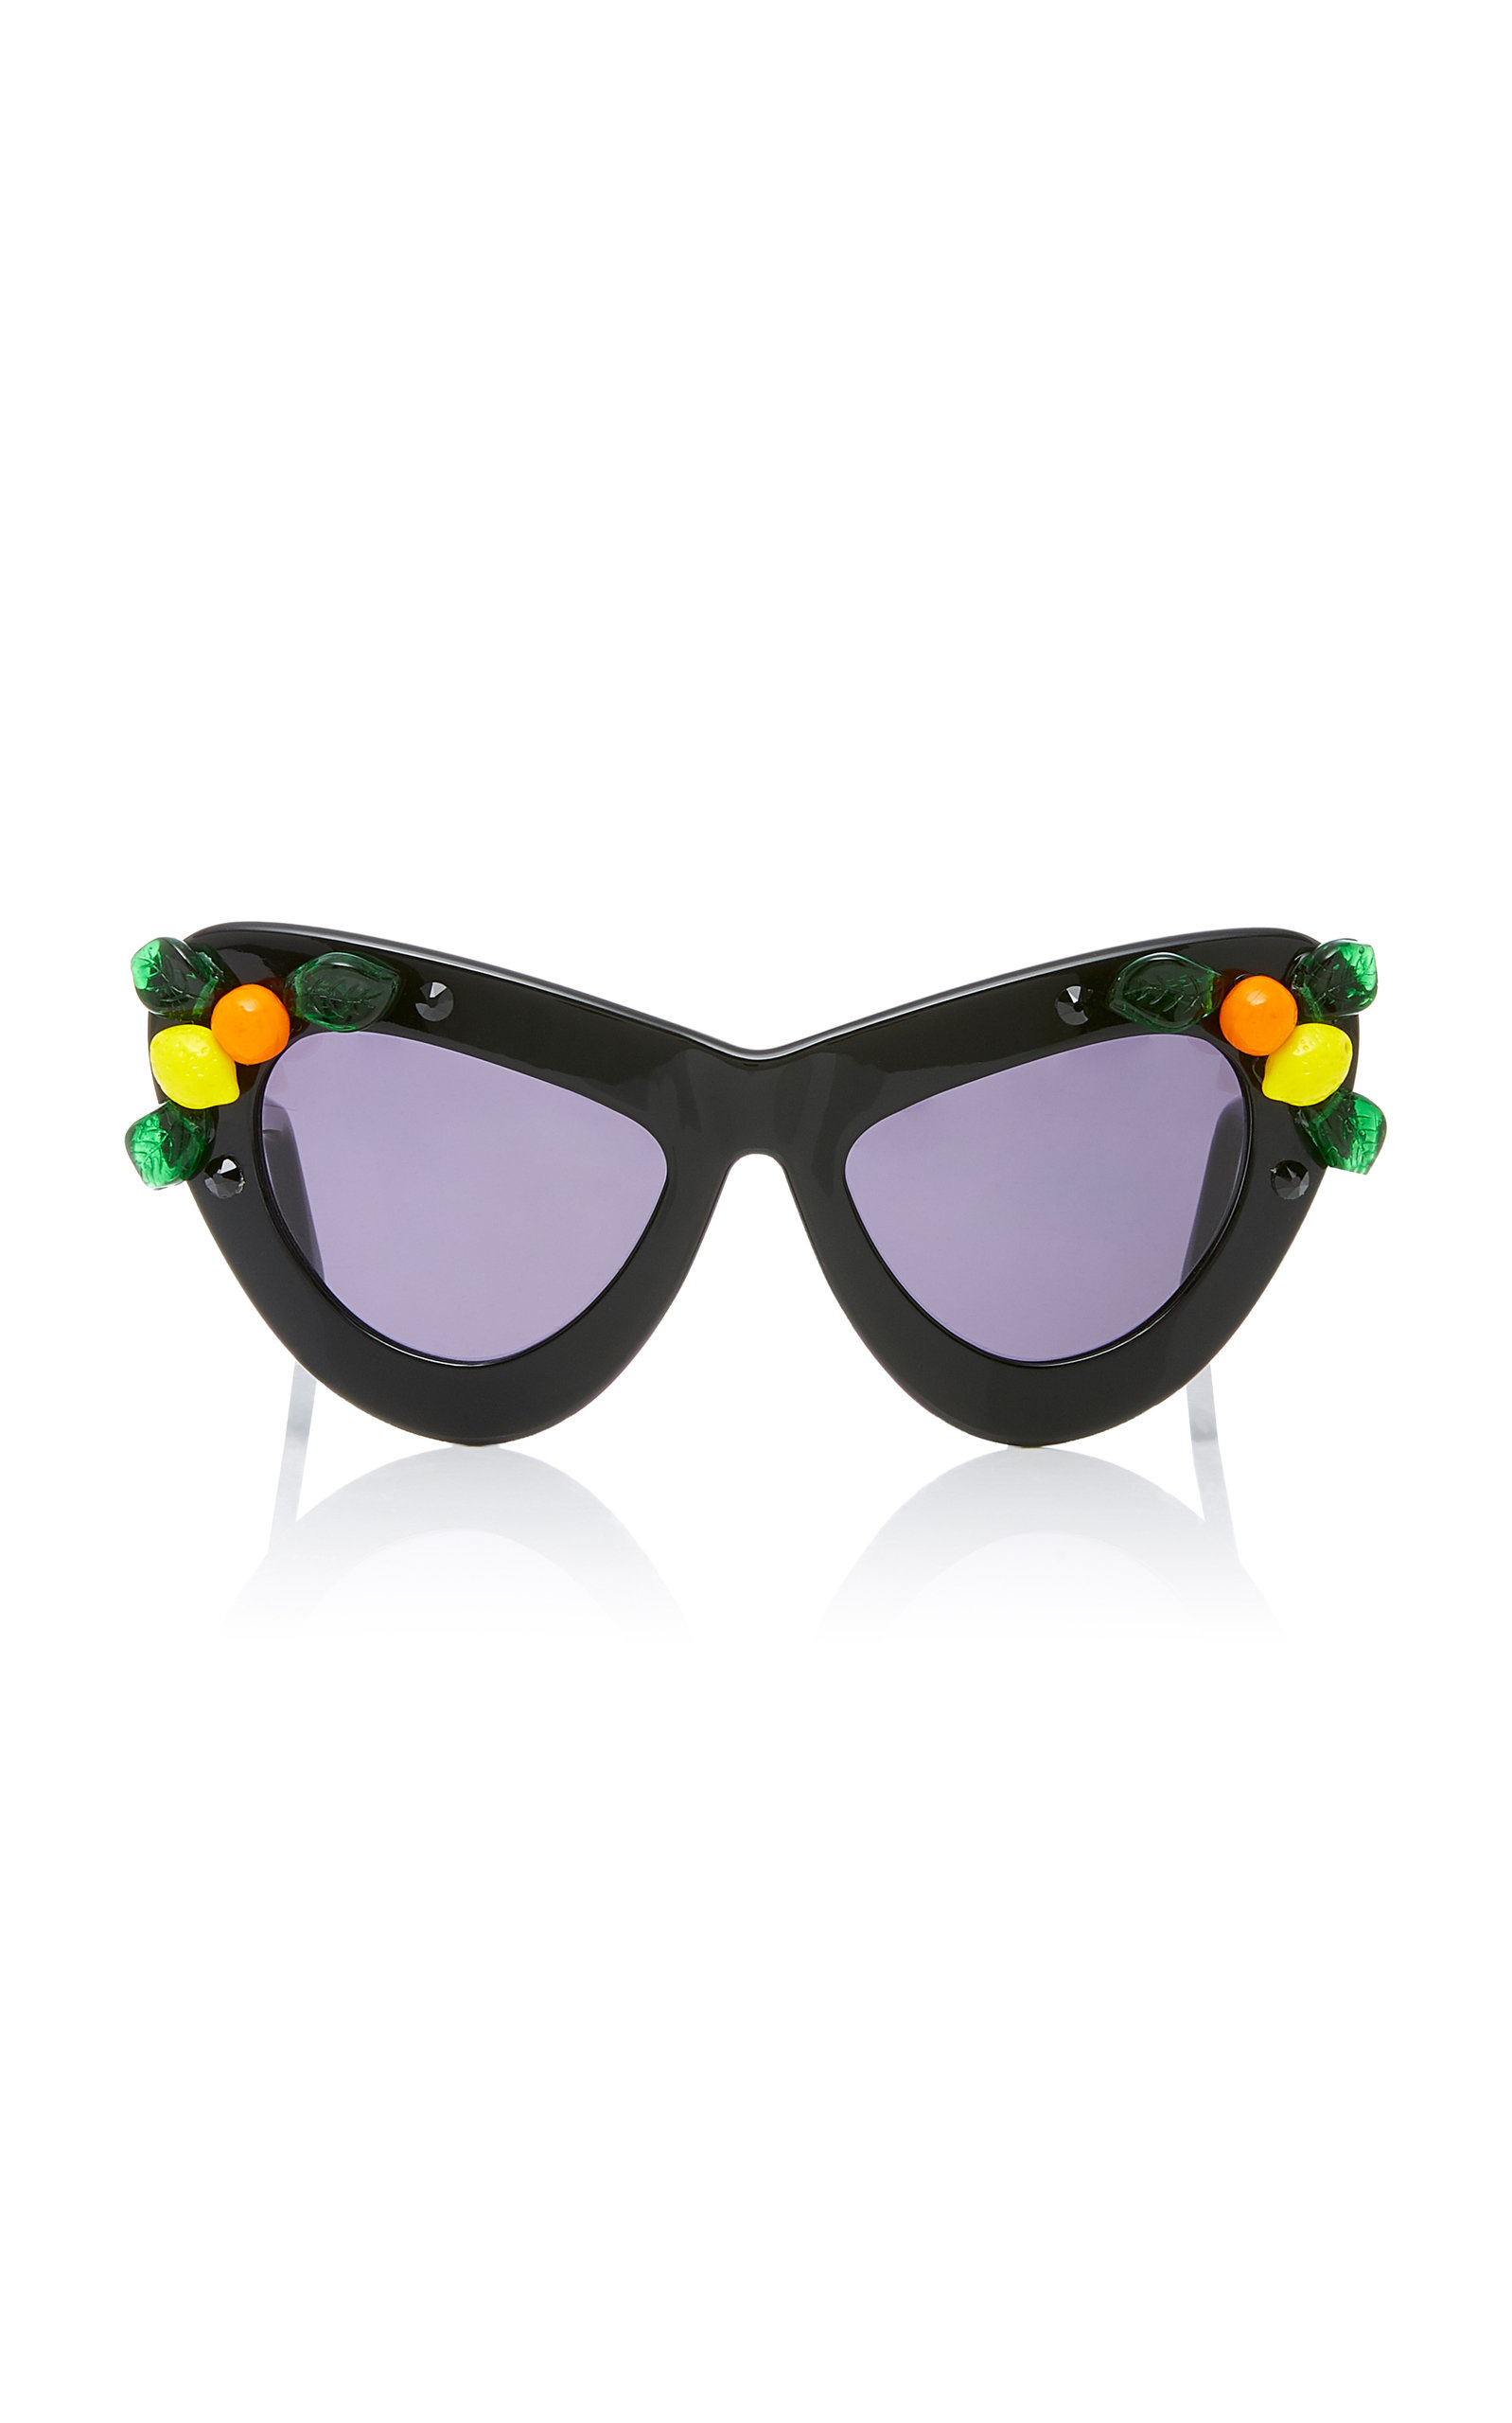 A-MORIR Citrus Cocktail Sunglasses in Black